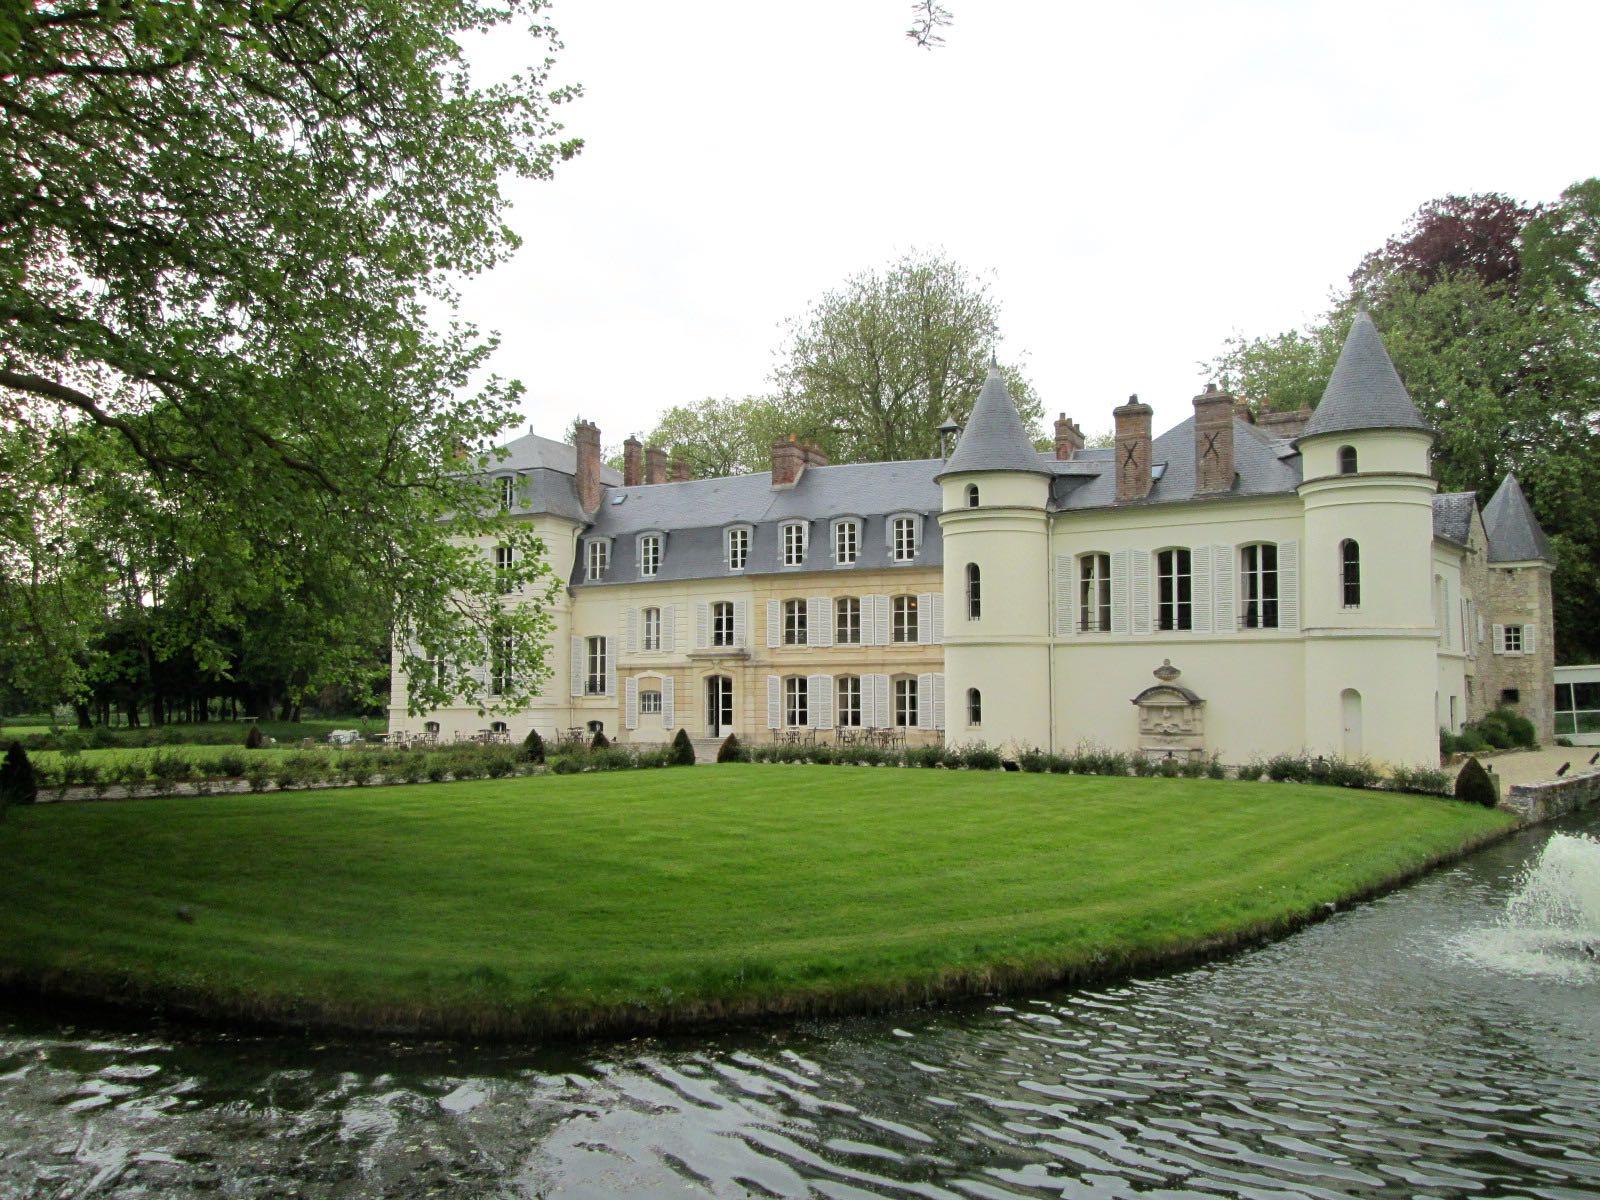 Chateau Saint-Just